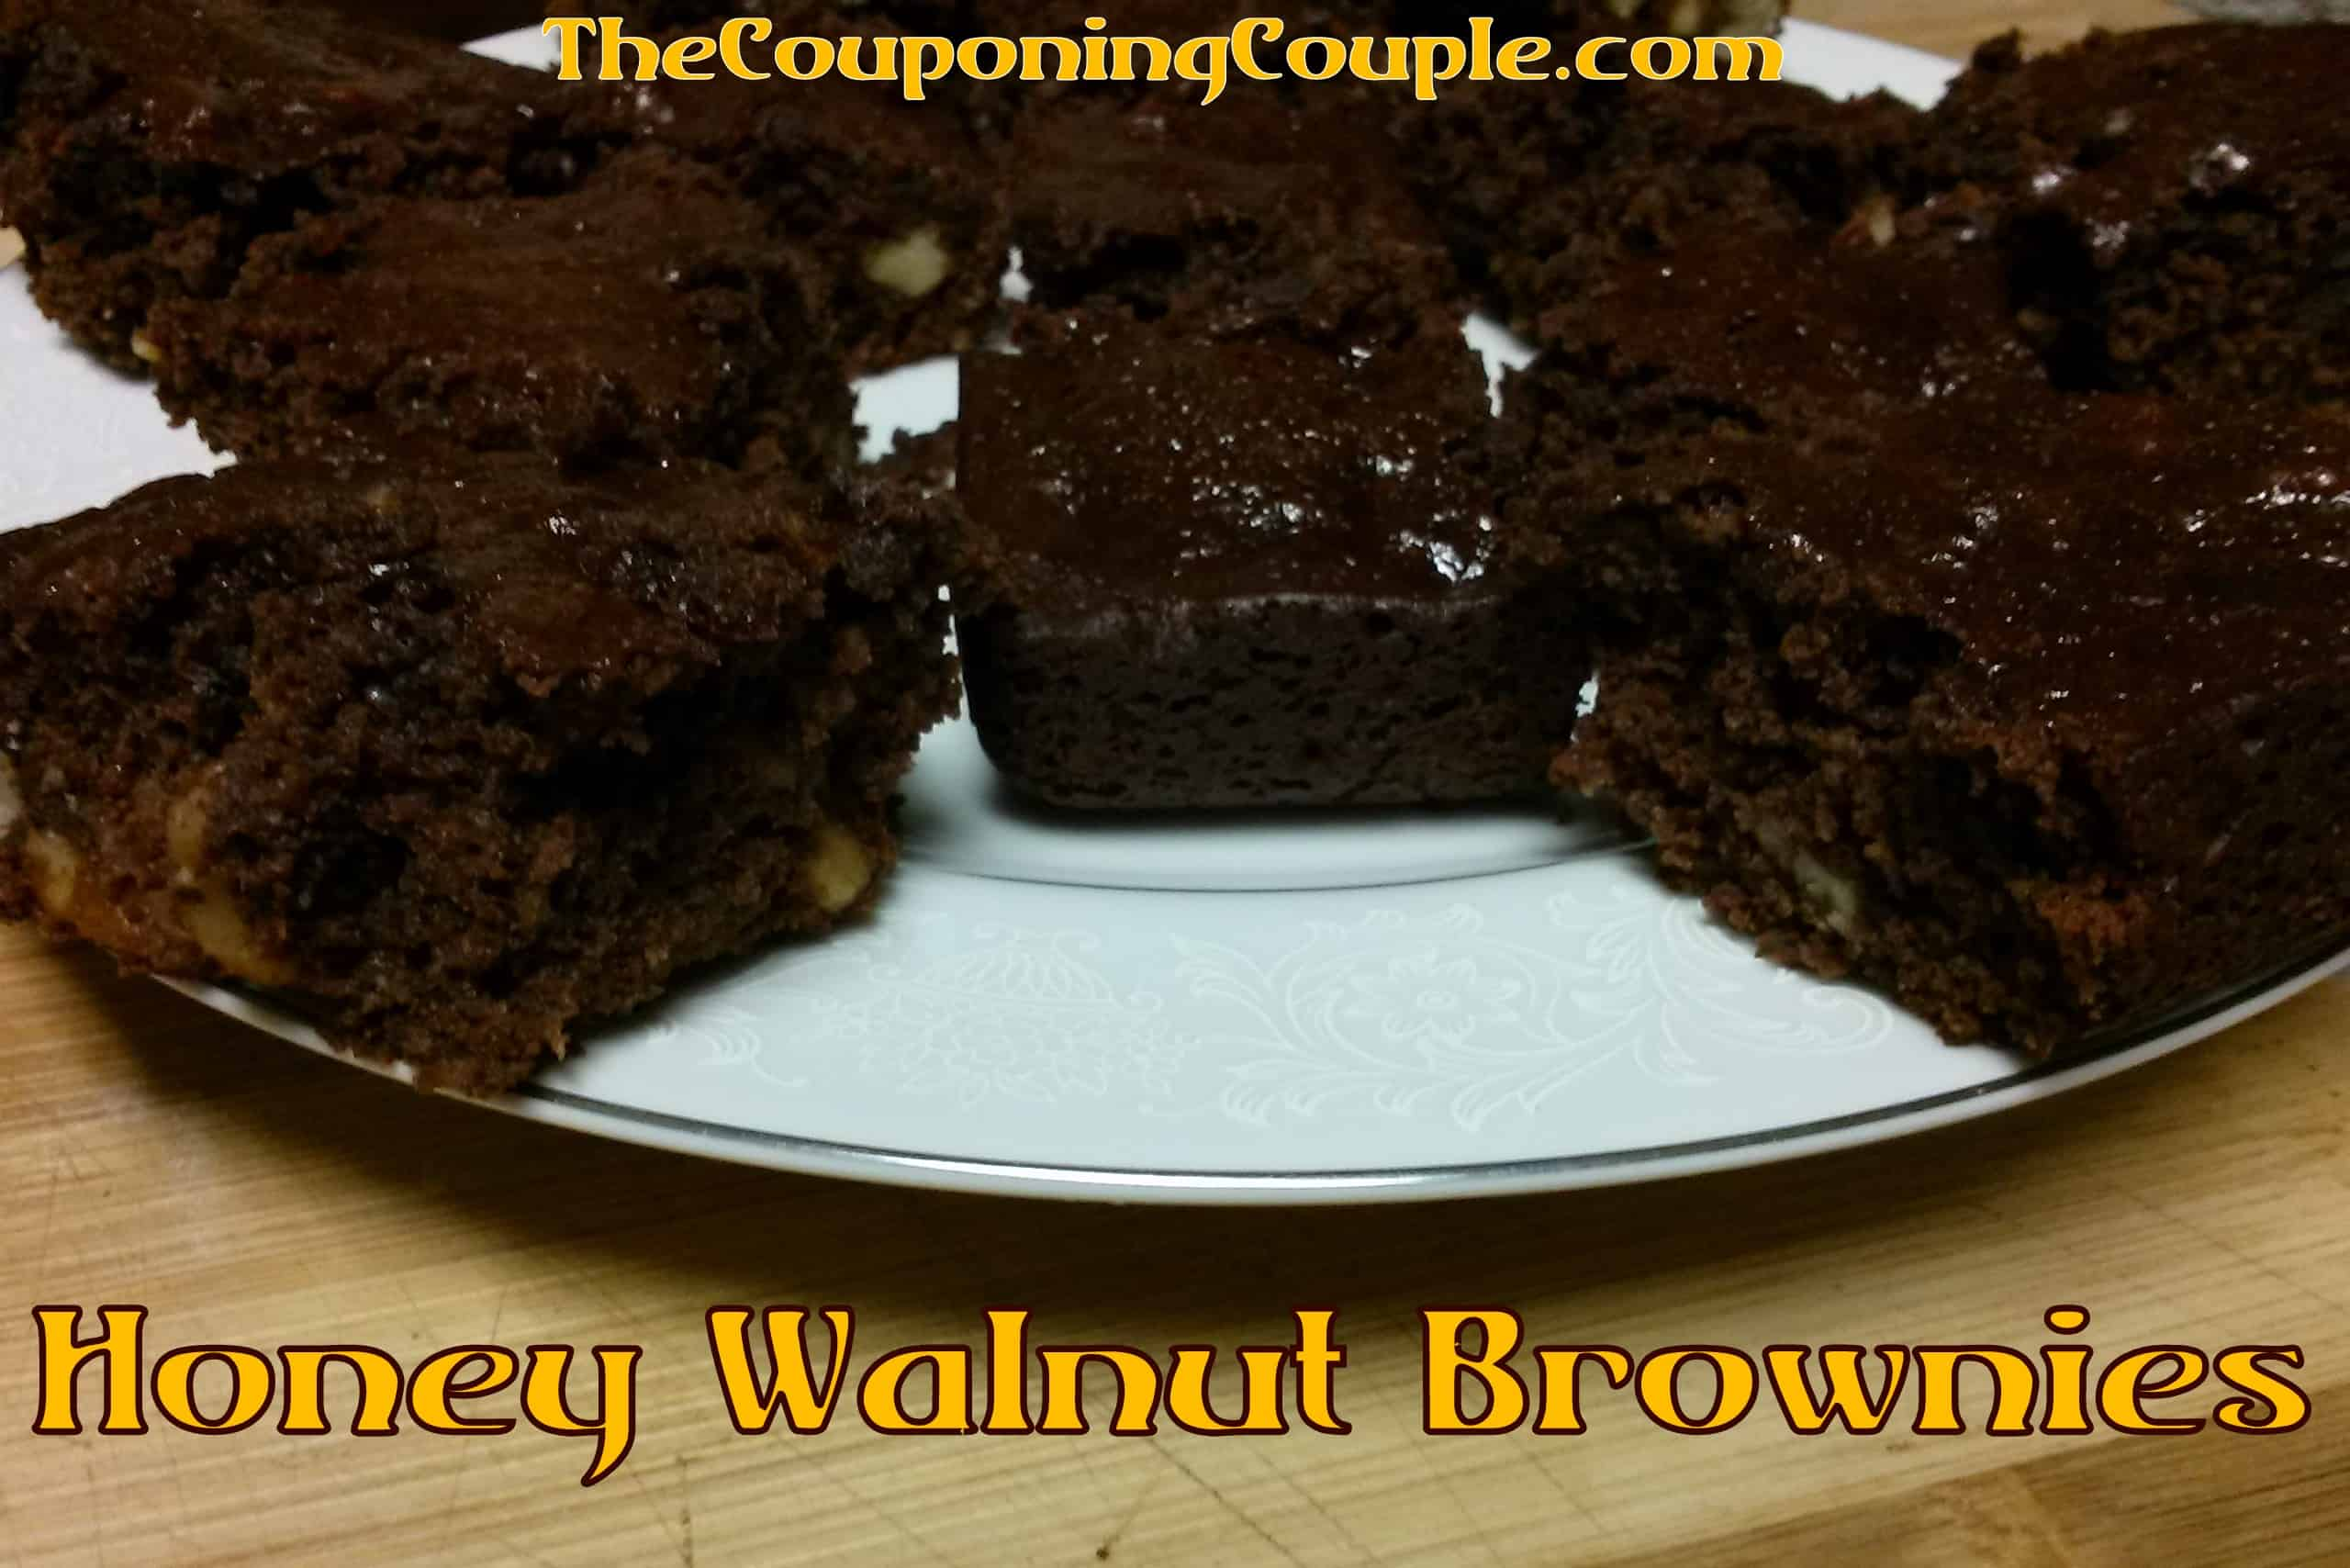 Honey walnut brownies